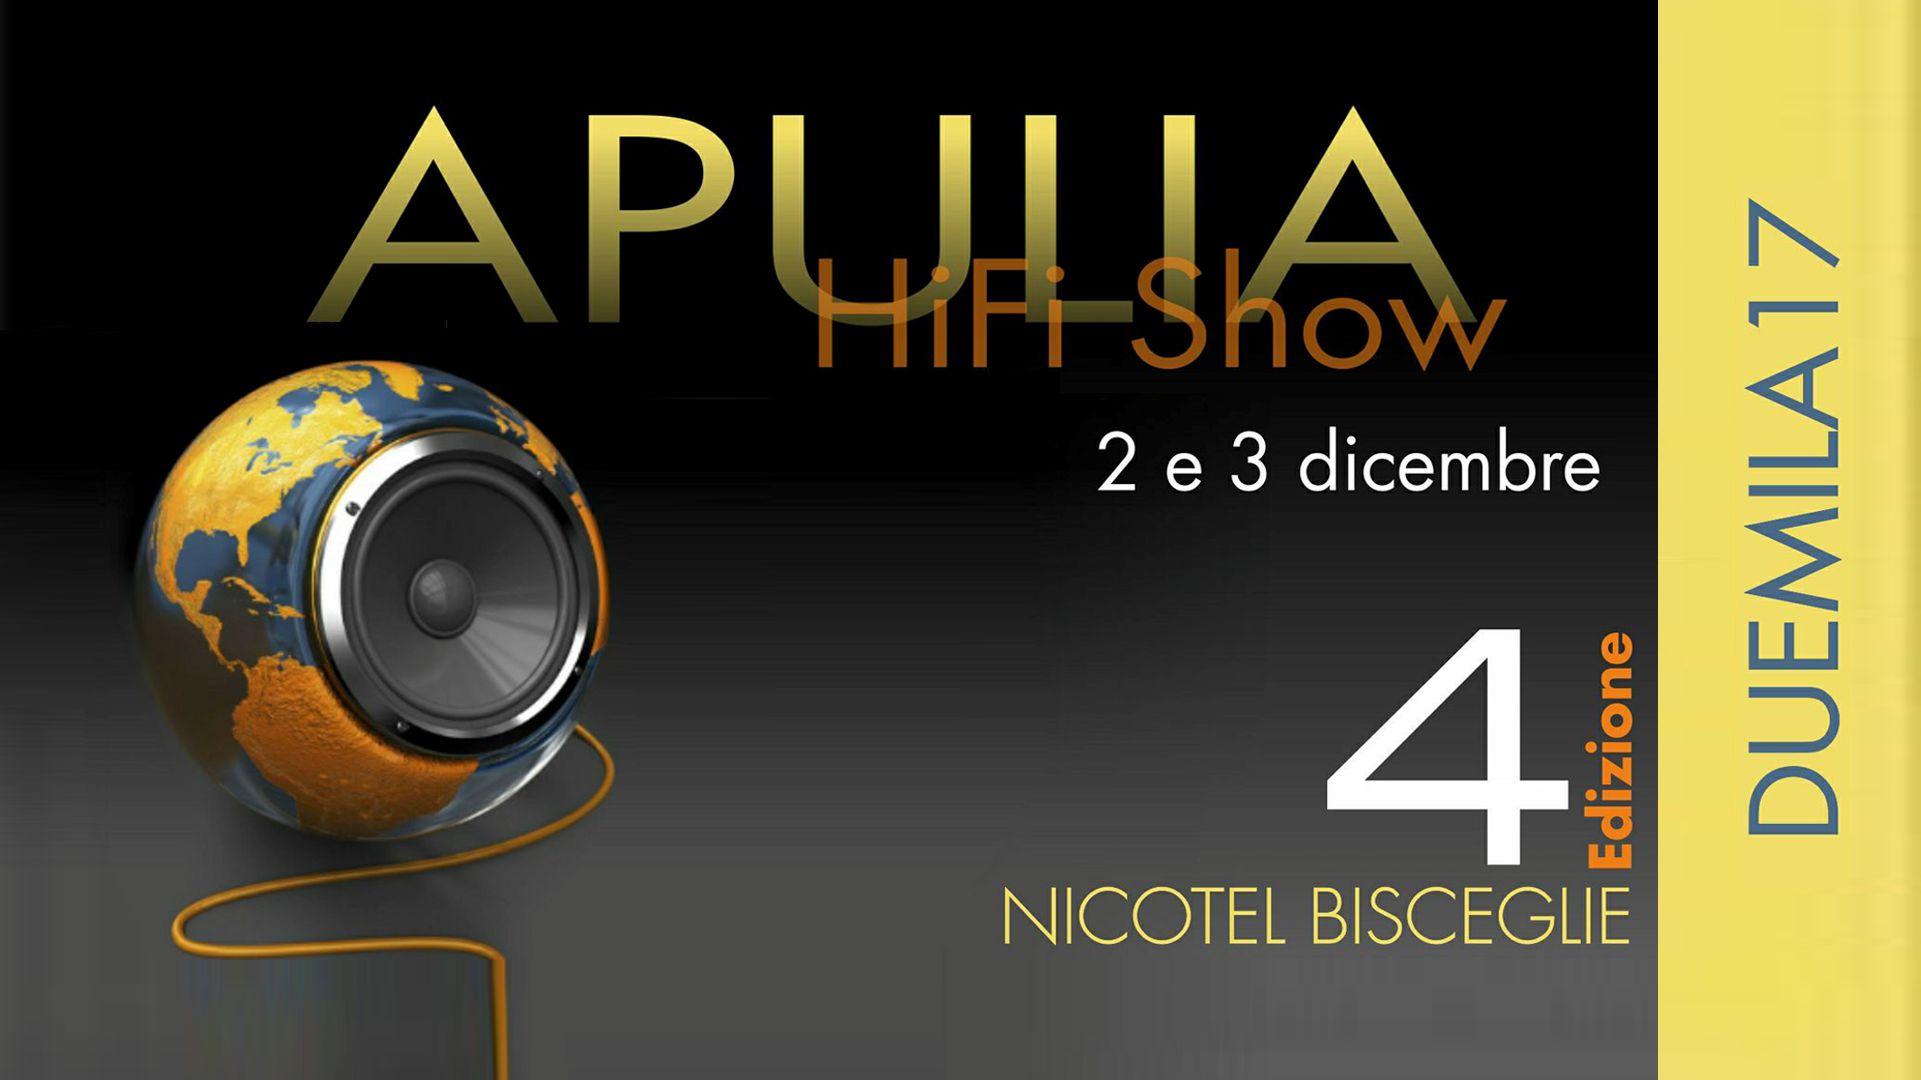 Apulia HiFi Show 2017